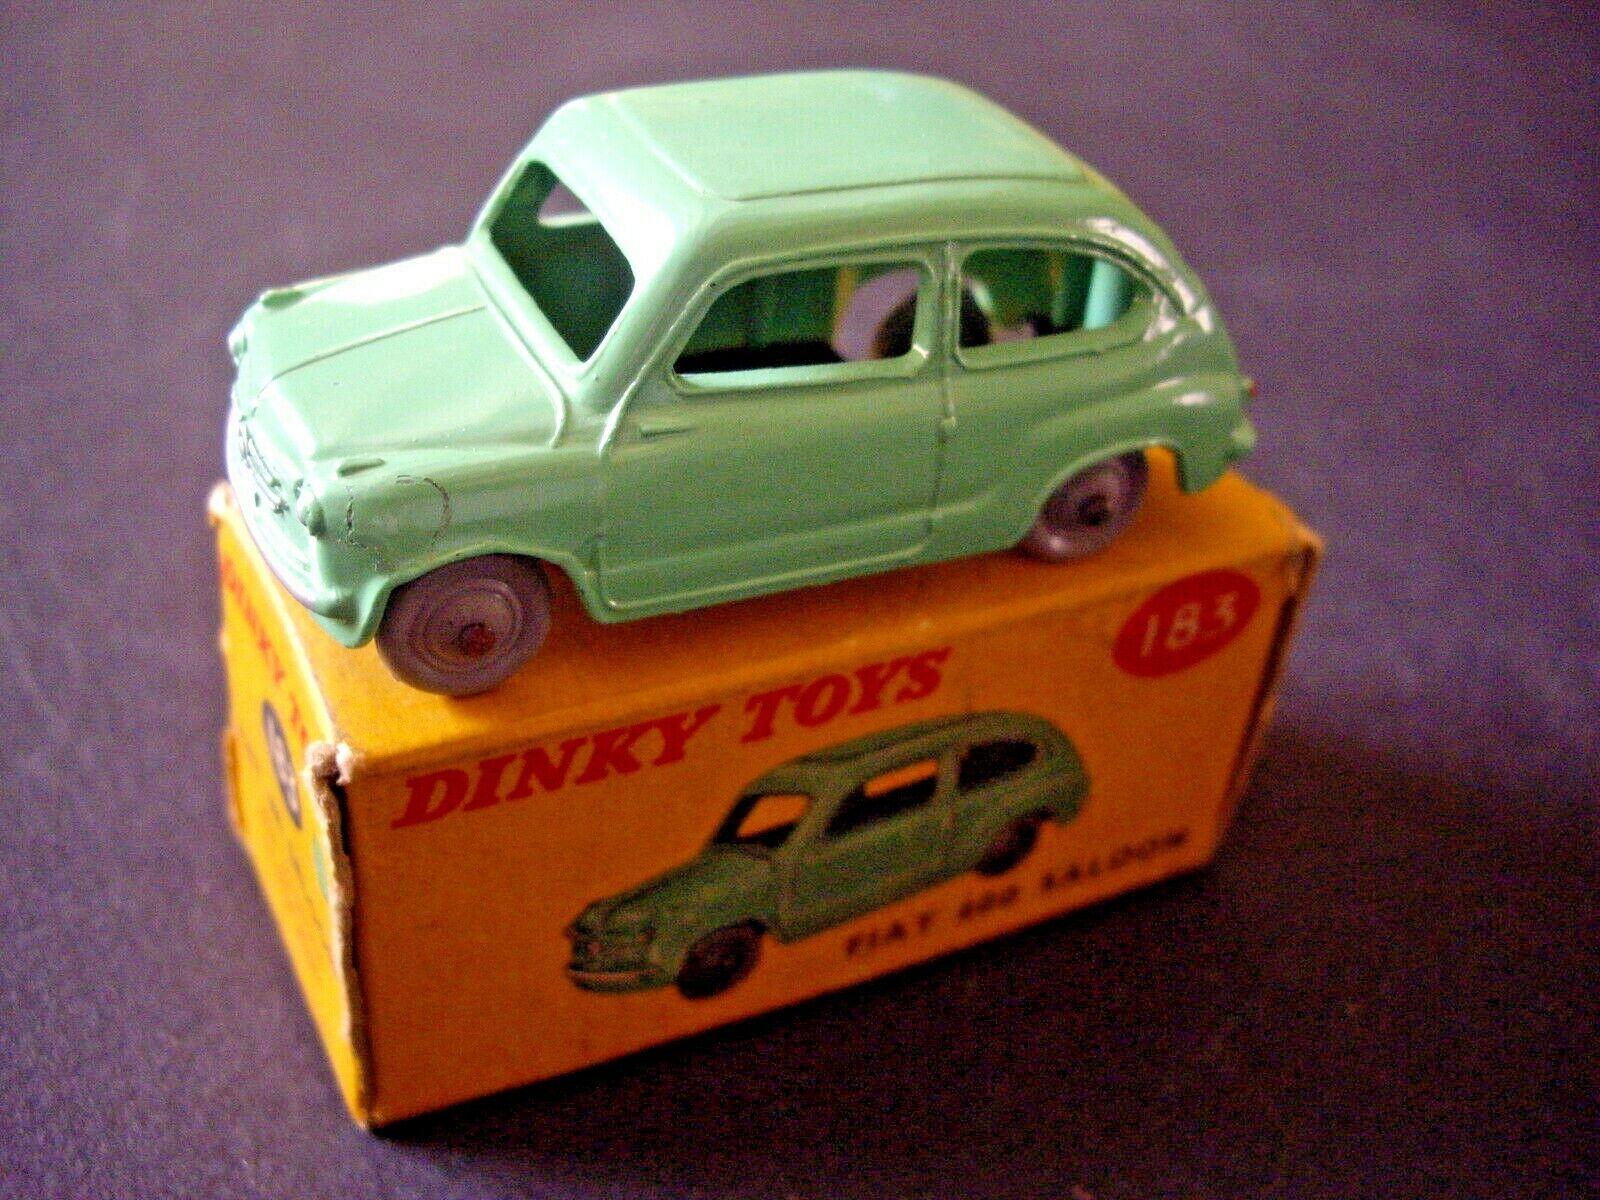 Venta barata DINKY TOYS 183 FIAT 600 SALOON + BOITE BOITE BOITE D'ORIGINE  Entrega directa y rápida de fábrica